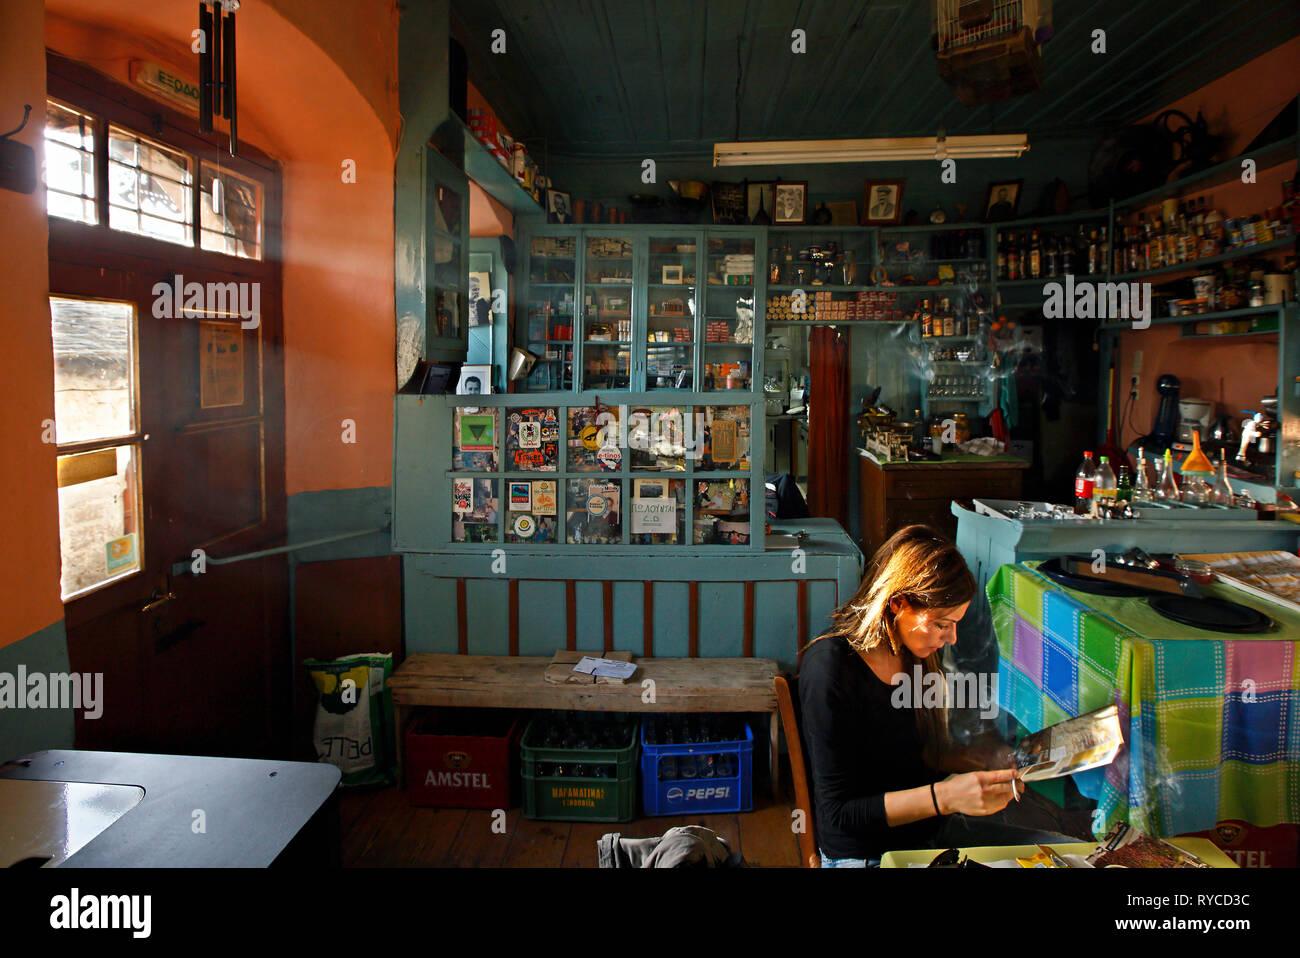 Inside 'Akanthos' kafeneio (traditional Greek coffee shop) in Kalarrytes village, Tzoumerka mountains, Ioannina, Epirus, Greece. - Stock Image